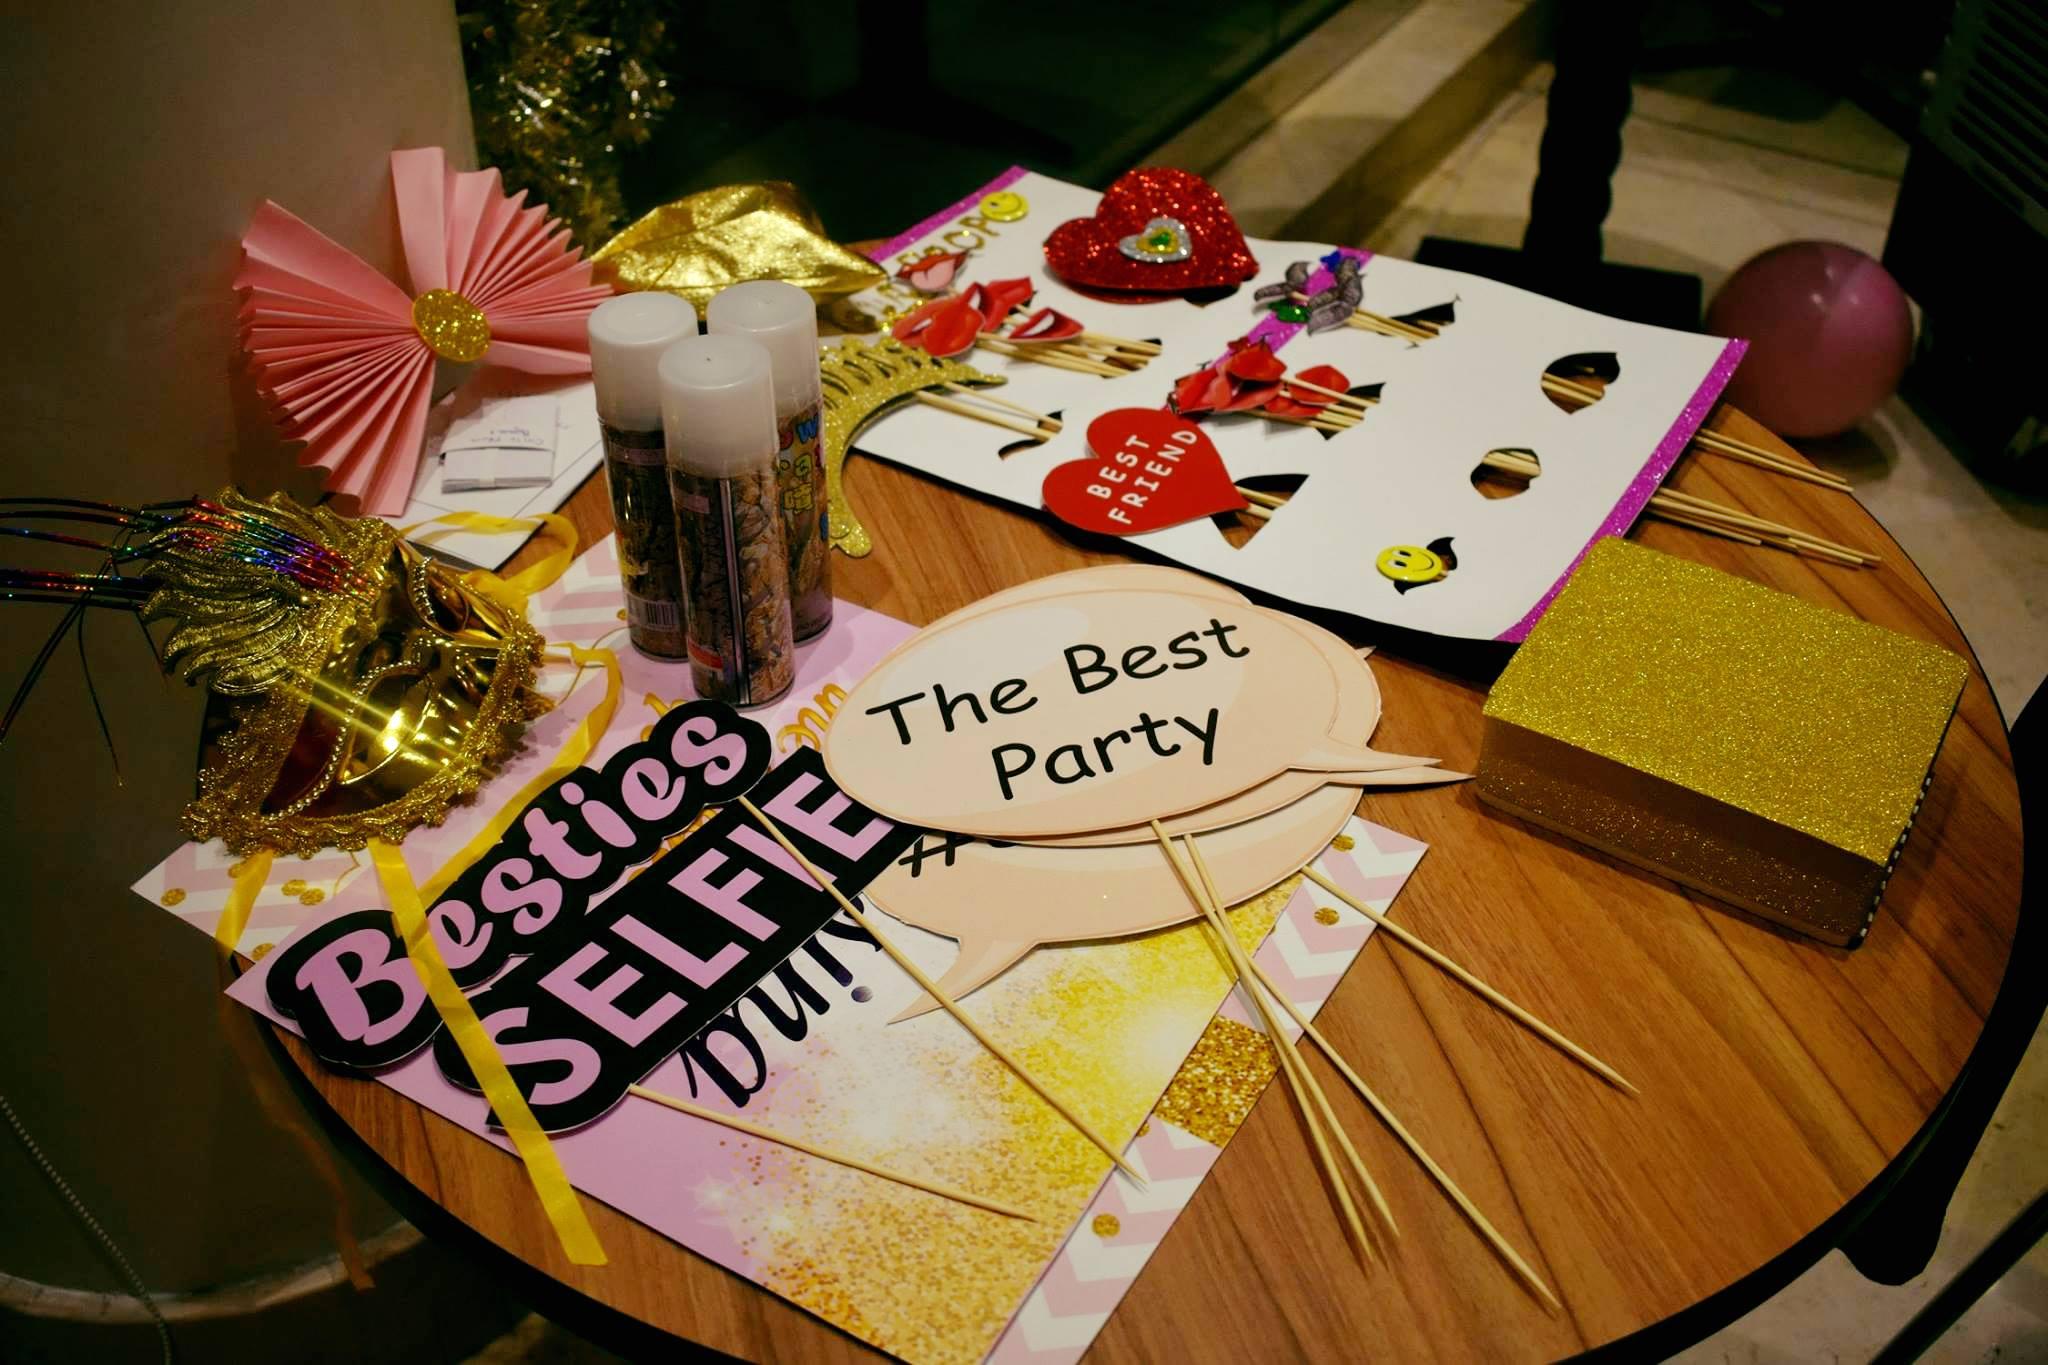 Top Personal Events, parties, events organizer in Dubai, Sharjah, Ajman, UAE